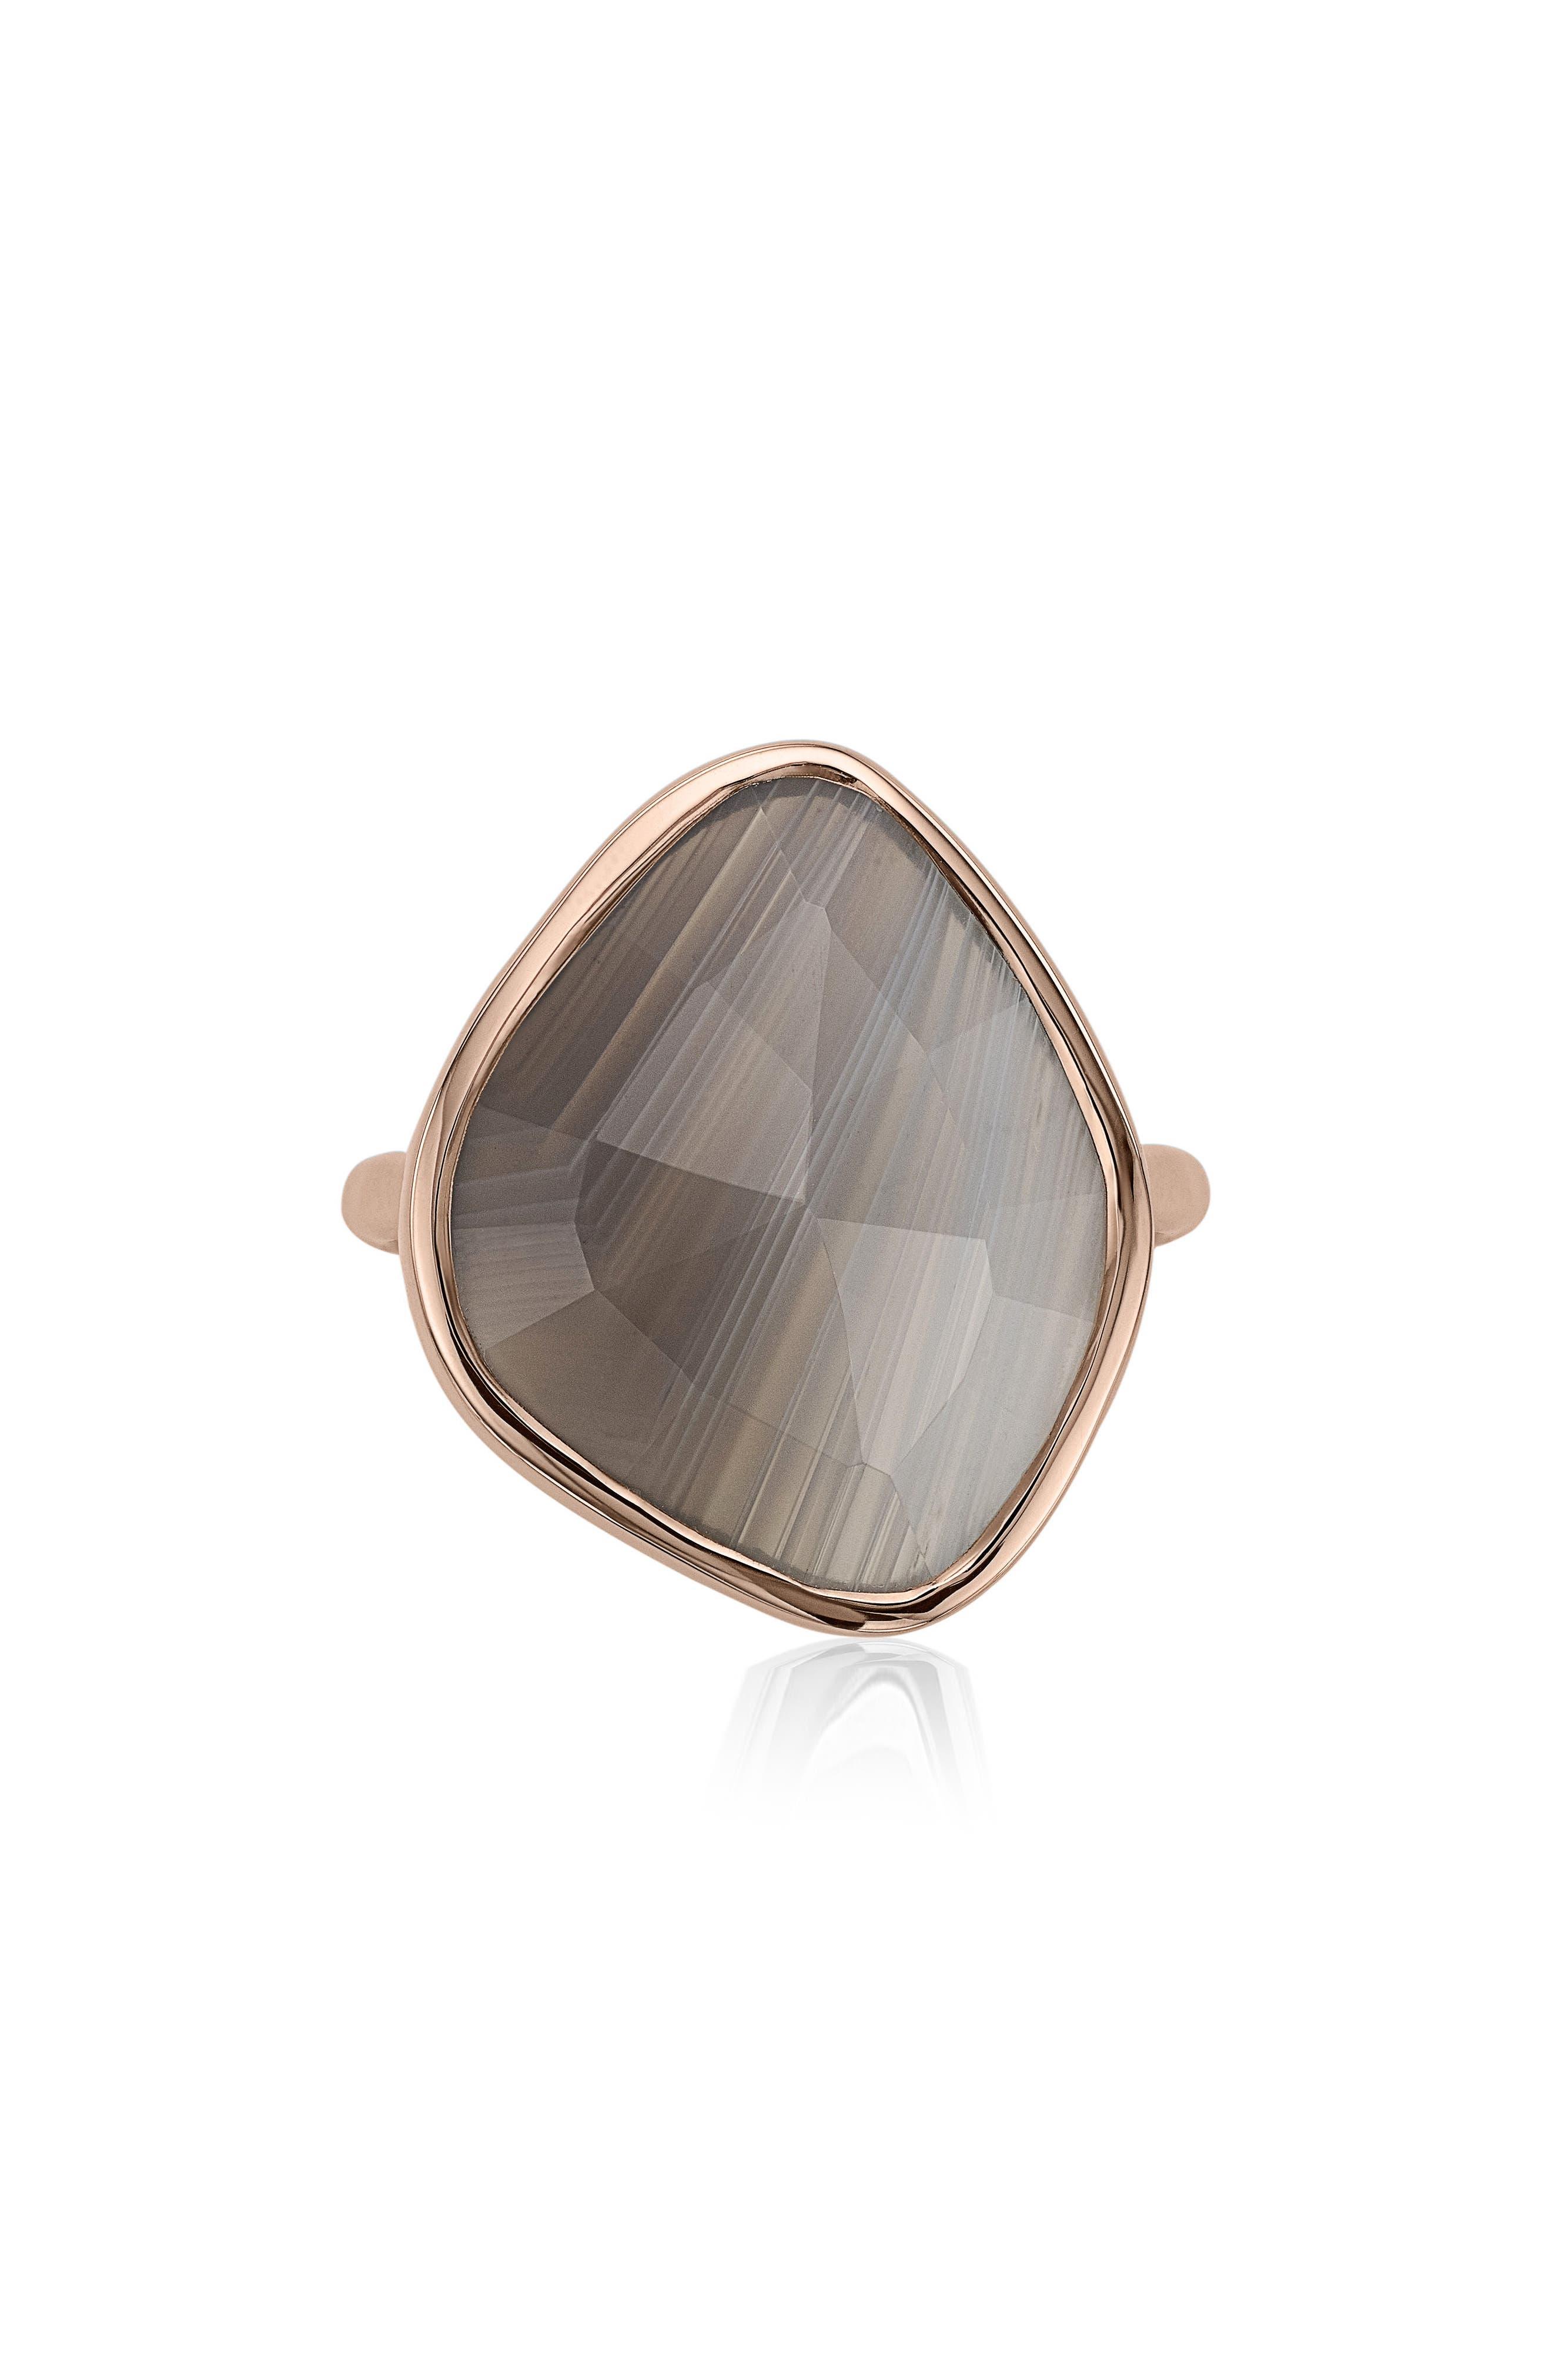 Monica Vinader Siren Nugget Semiprecious Stone Ring